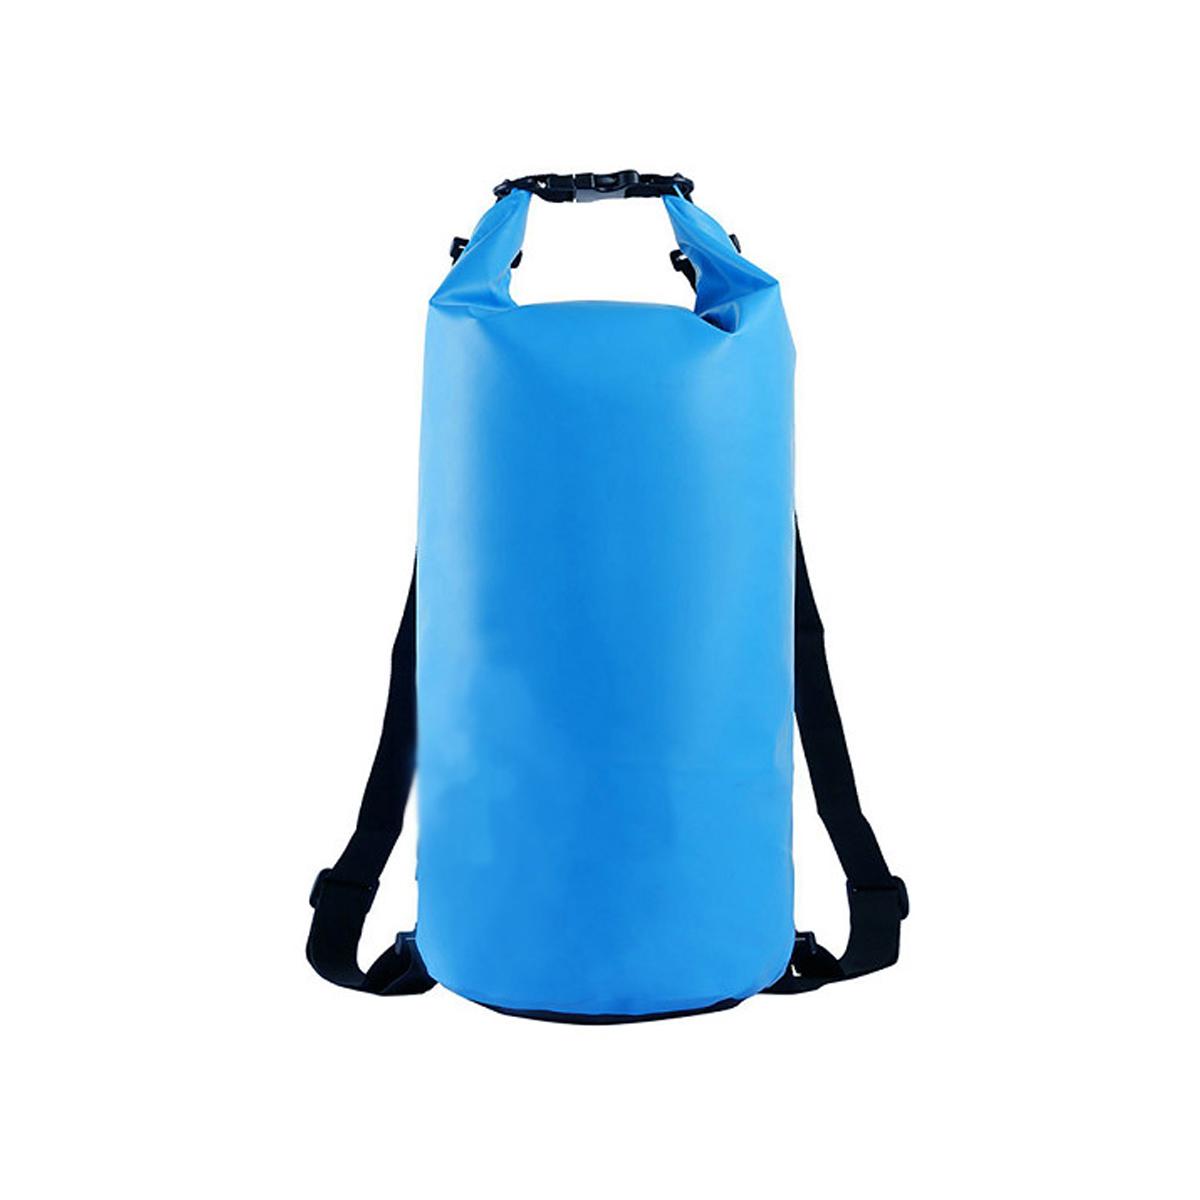 MiniMu Backpack 20L blue